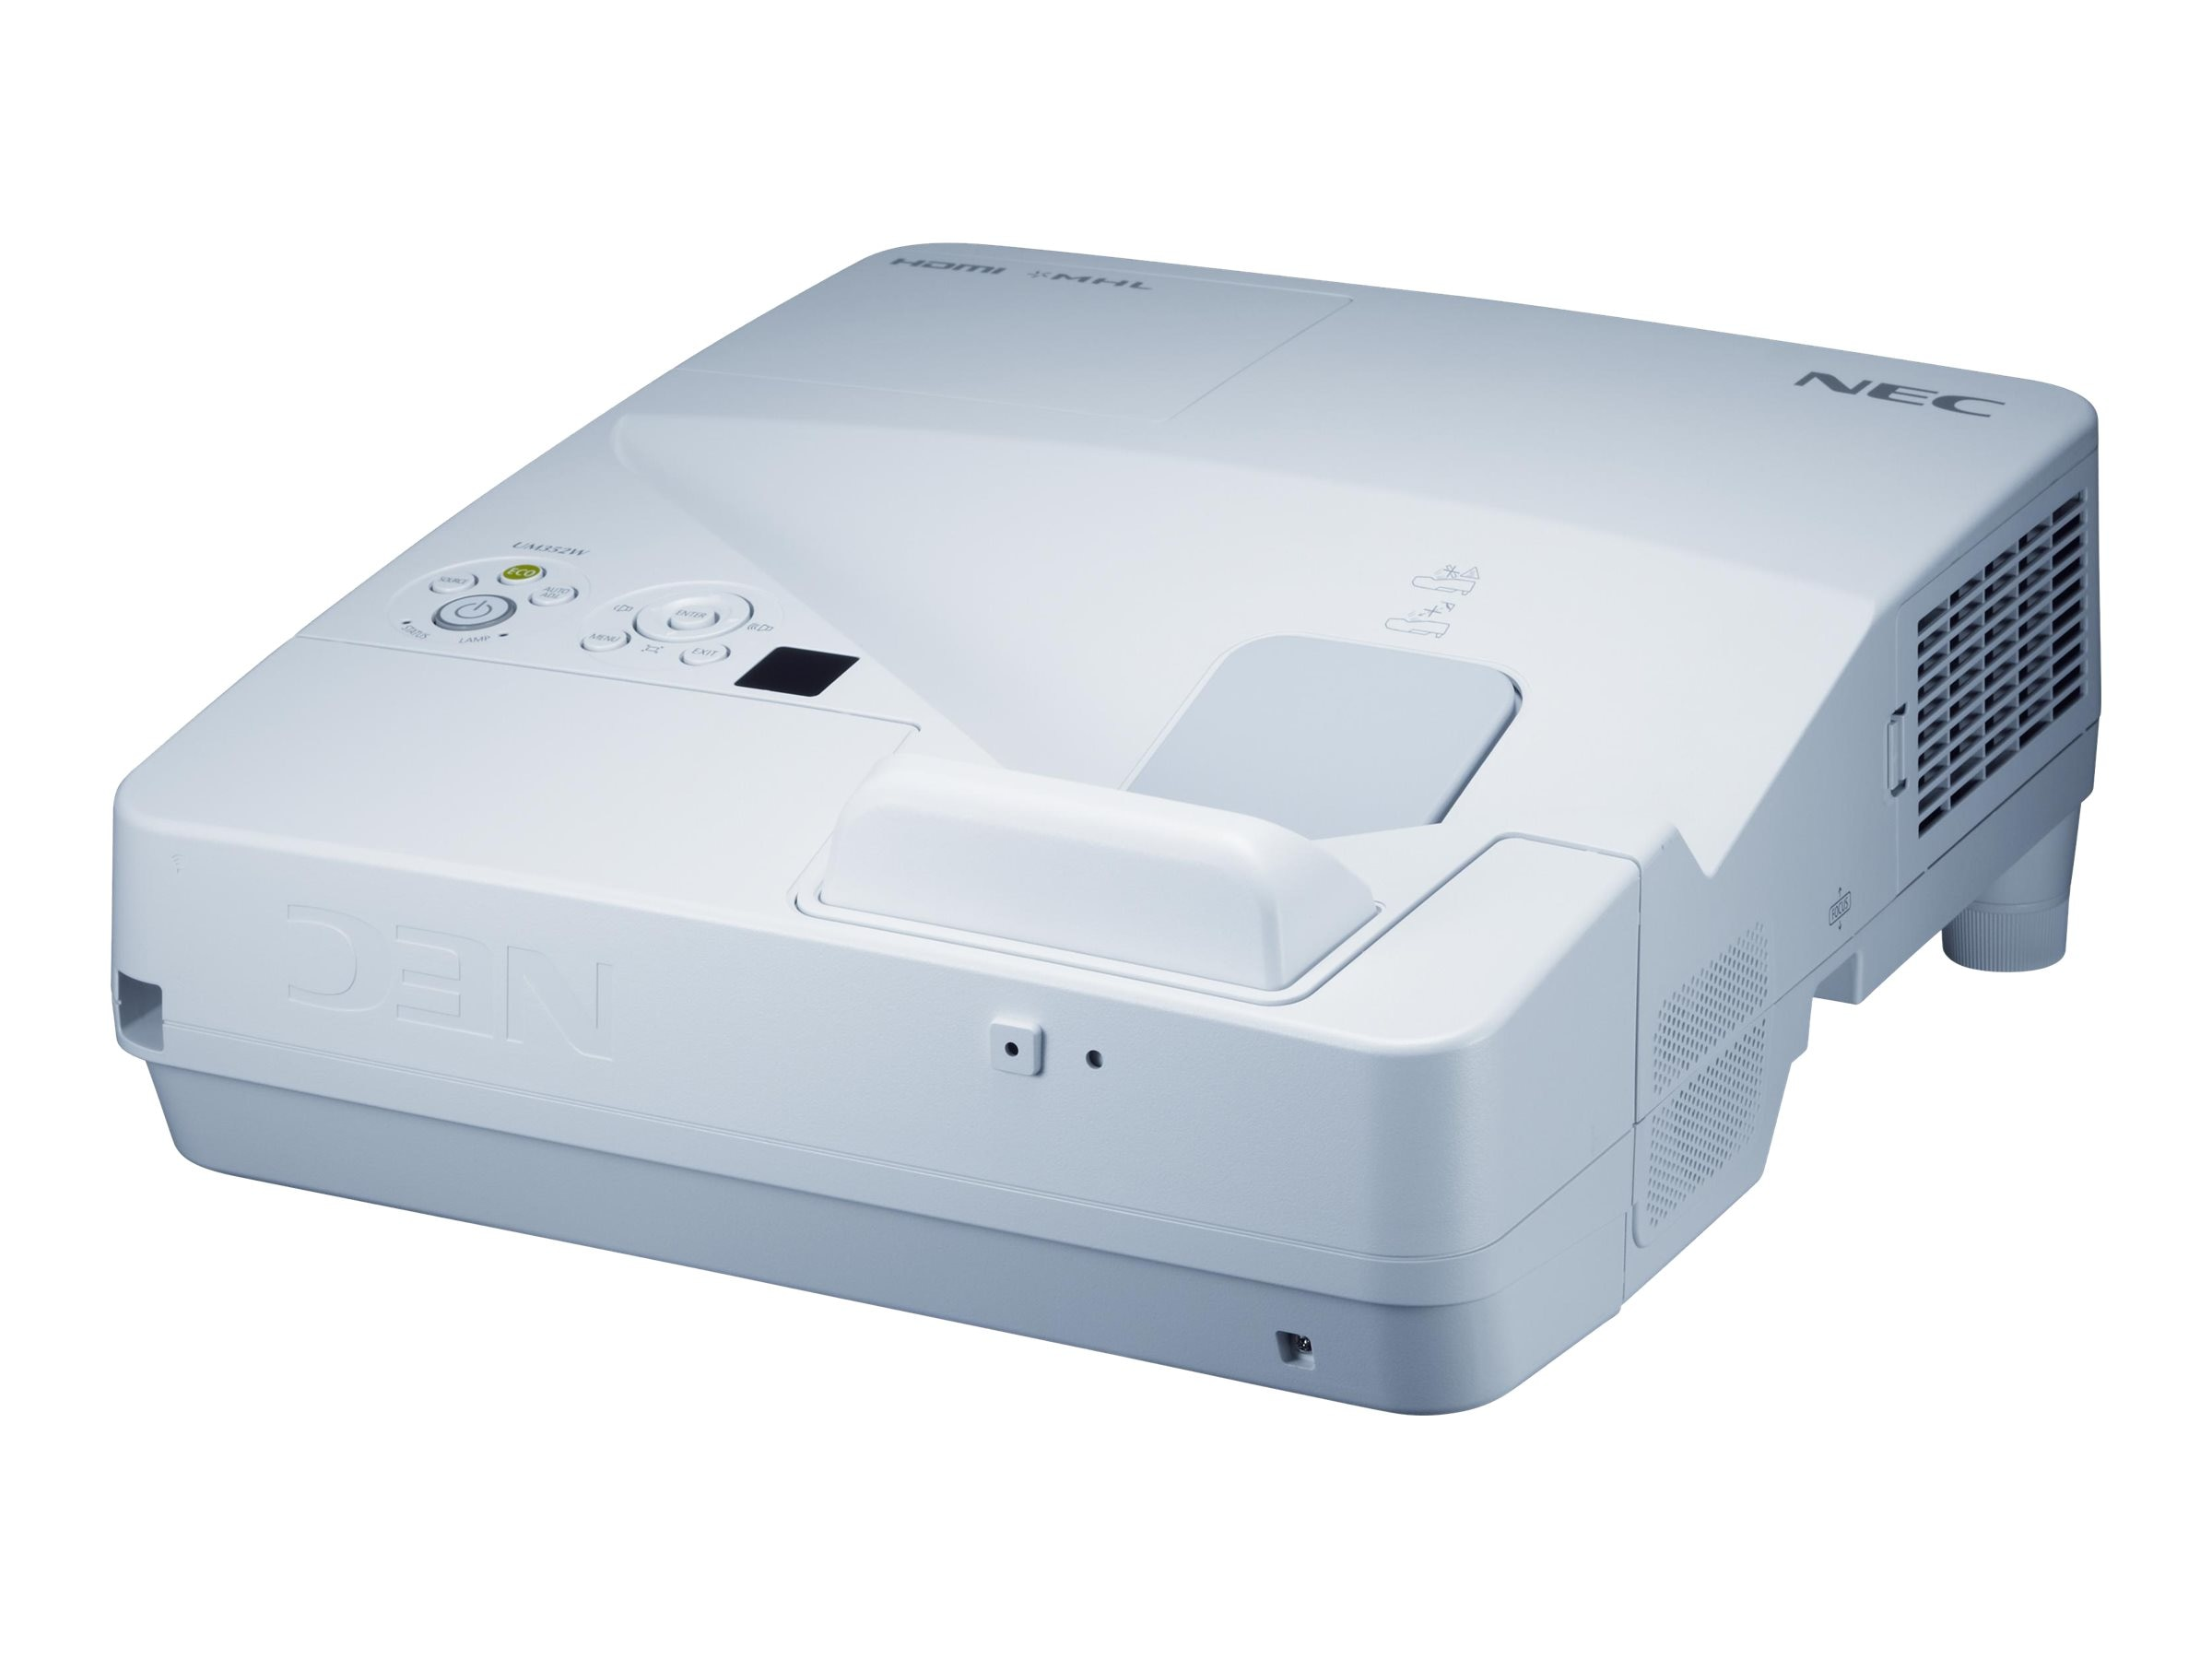 NEC UM352W WXGA LCD Interactive Projector, 3500 Lumens, White, NP-UM352W, 22429852, Projectors